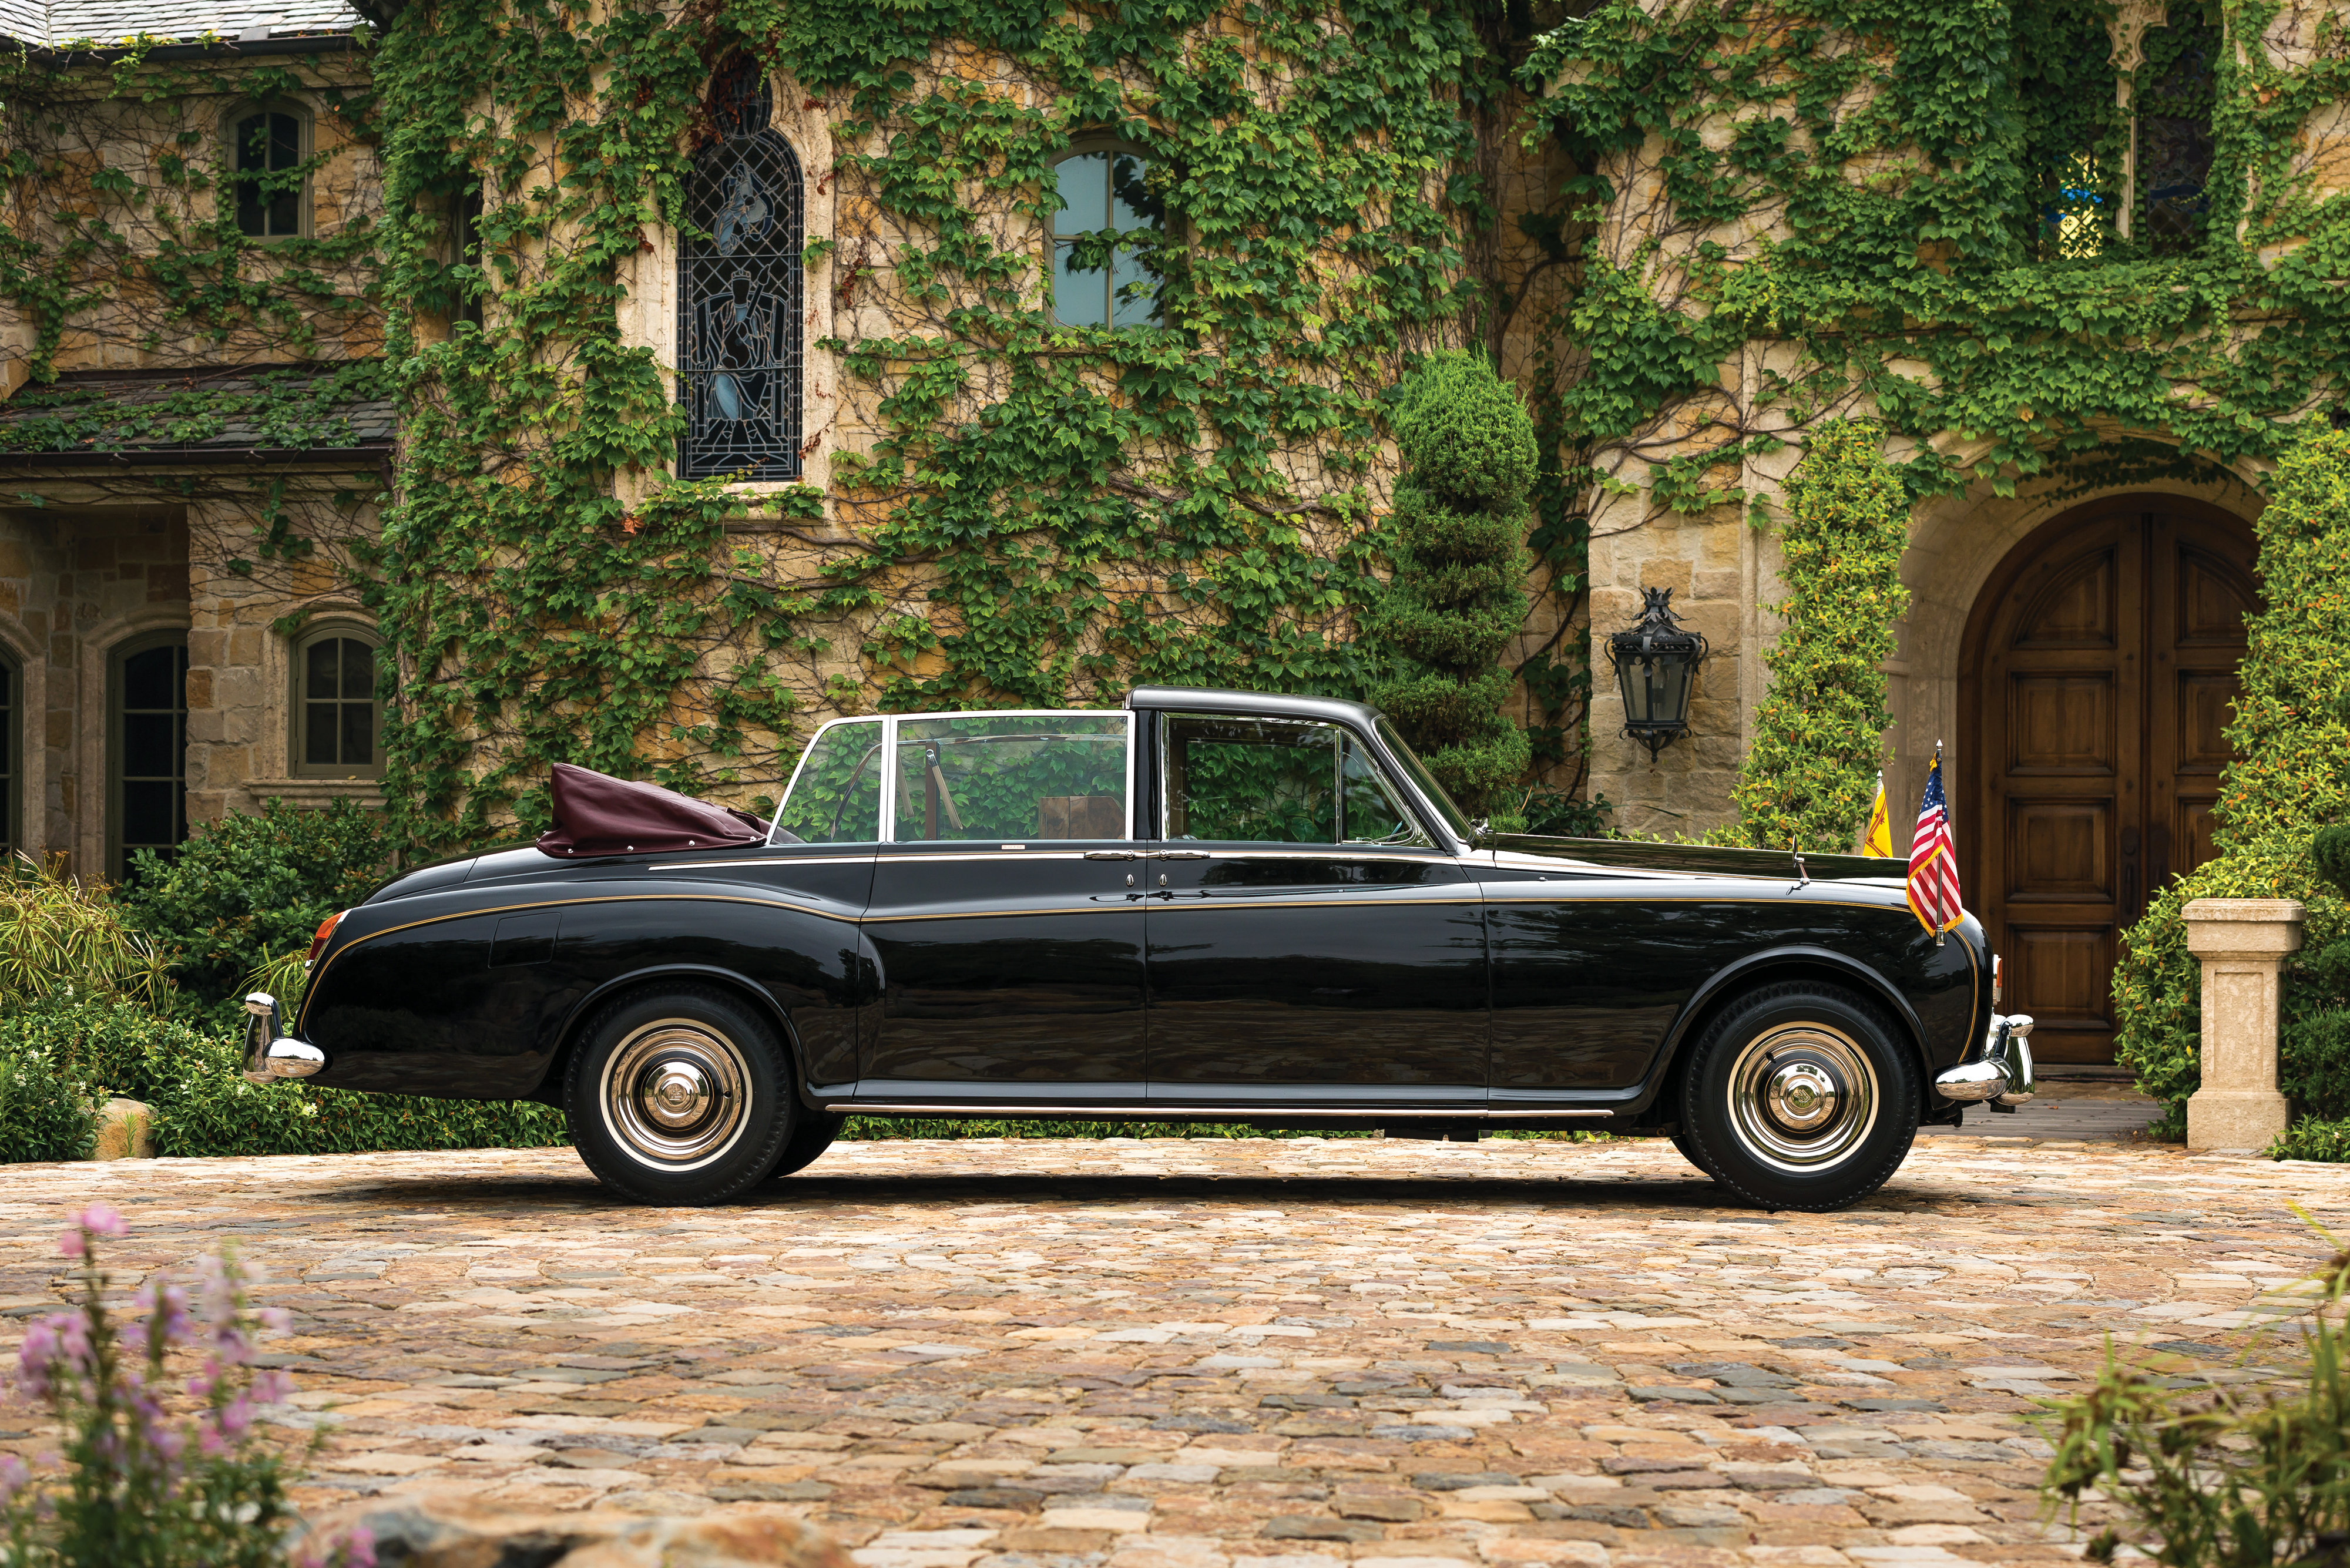 A 1967 Rolls-Royce Phantom V State Landaulet by Mulliner Park Ward.